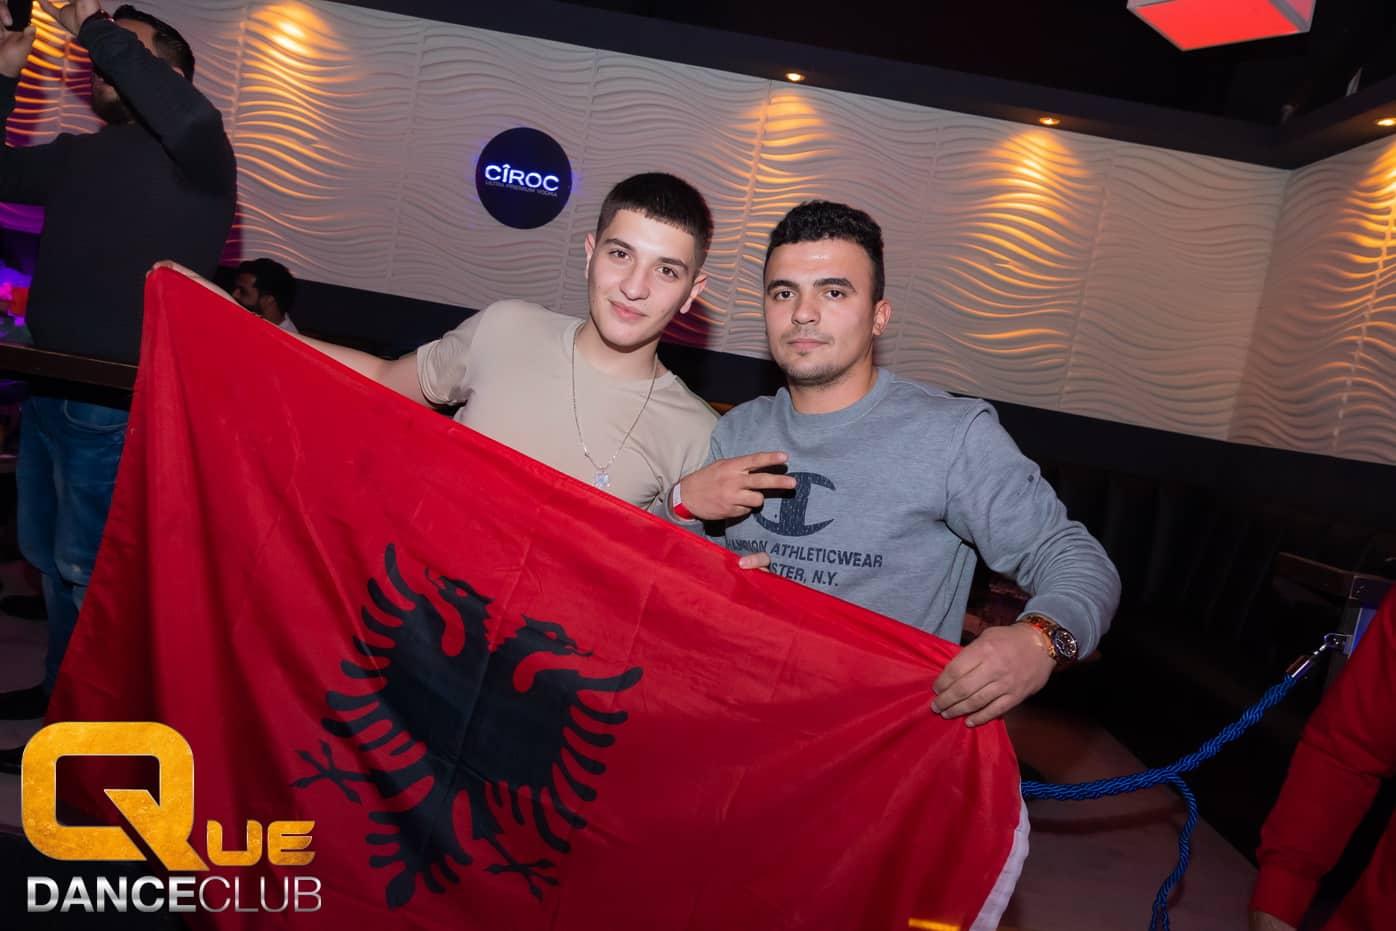 2018_12_08_Que_Danceclub_Paparazzo_Night_Ardian_Bujupi_Live_Nightlife_Scene_Timo_029